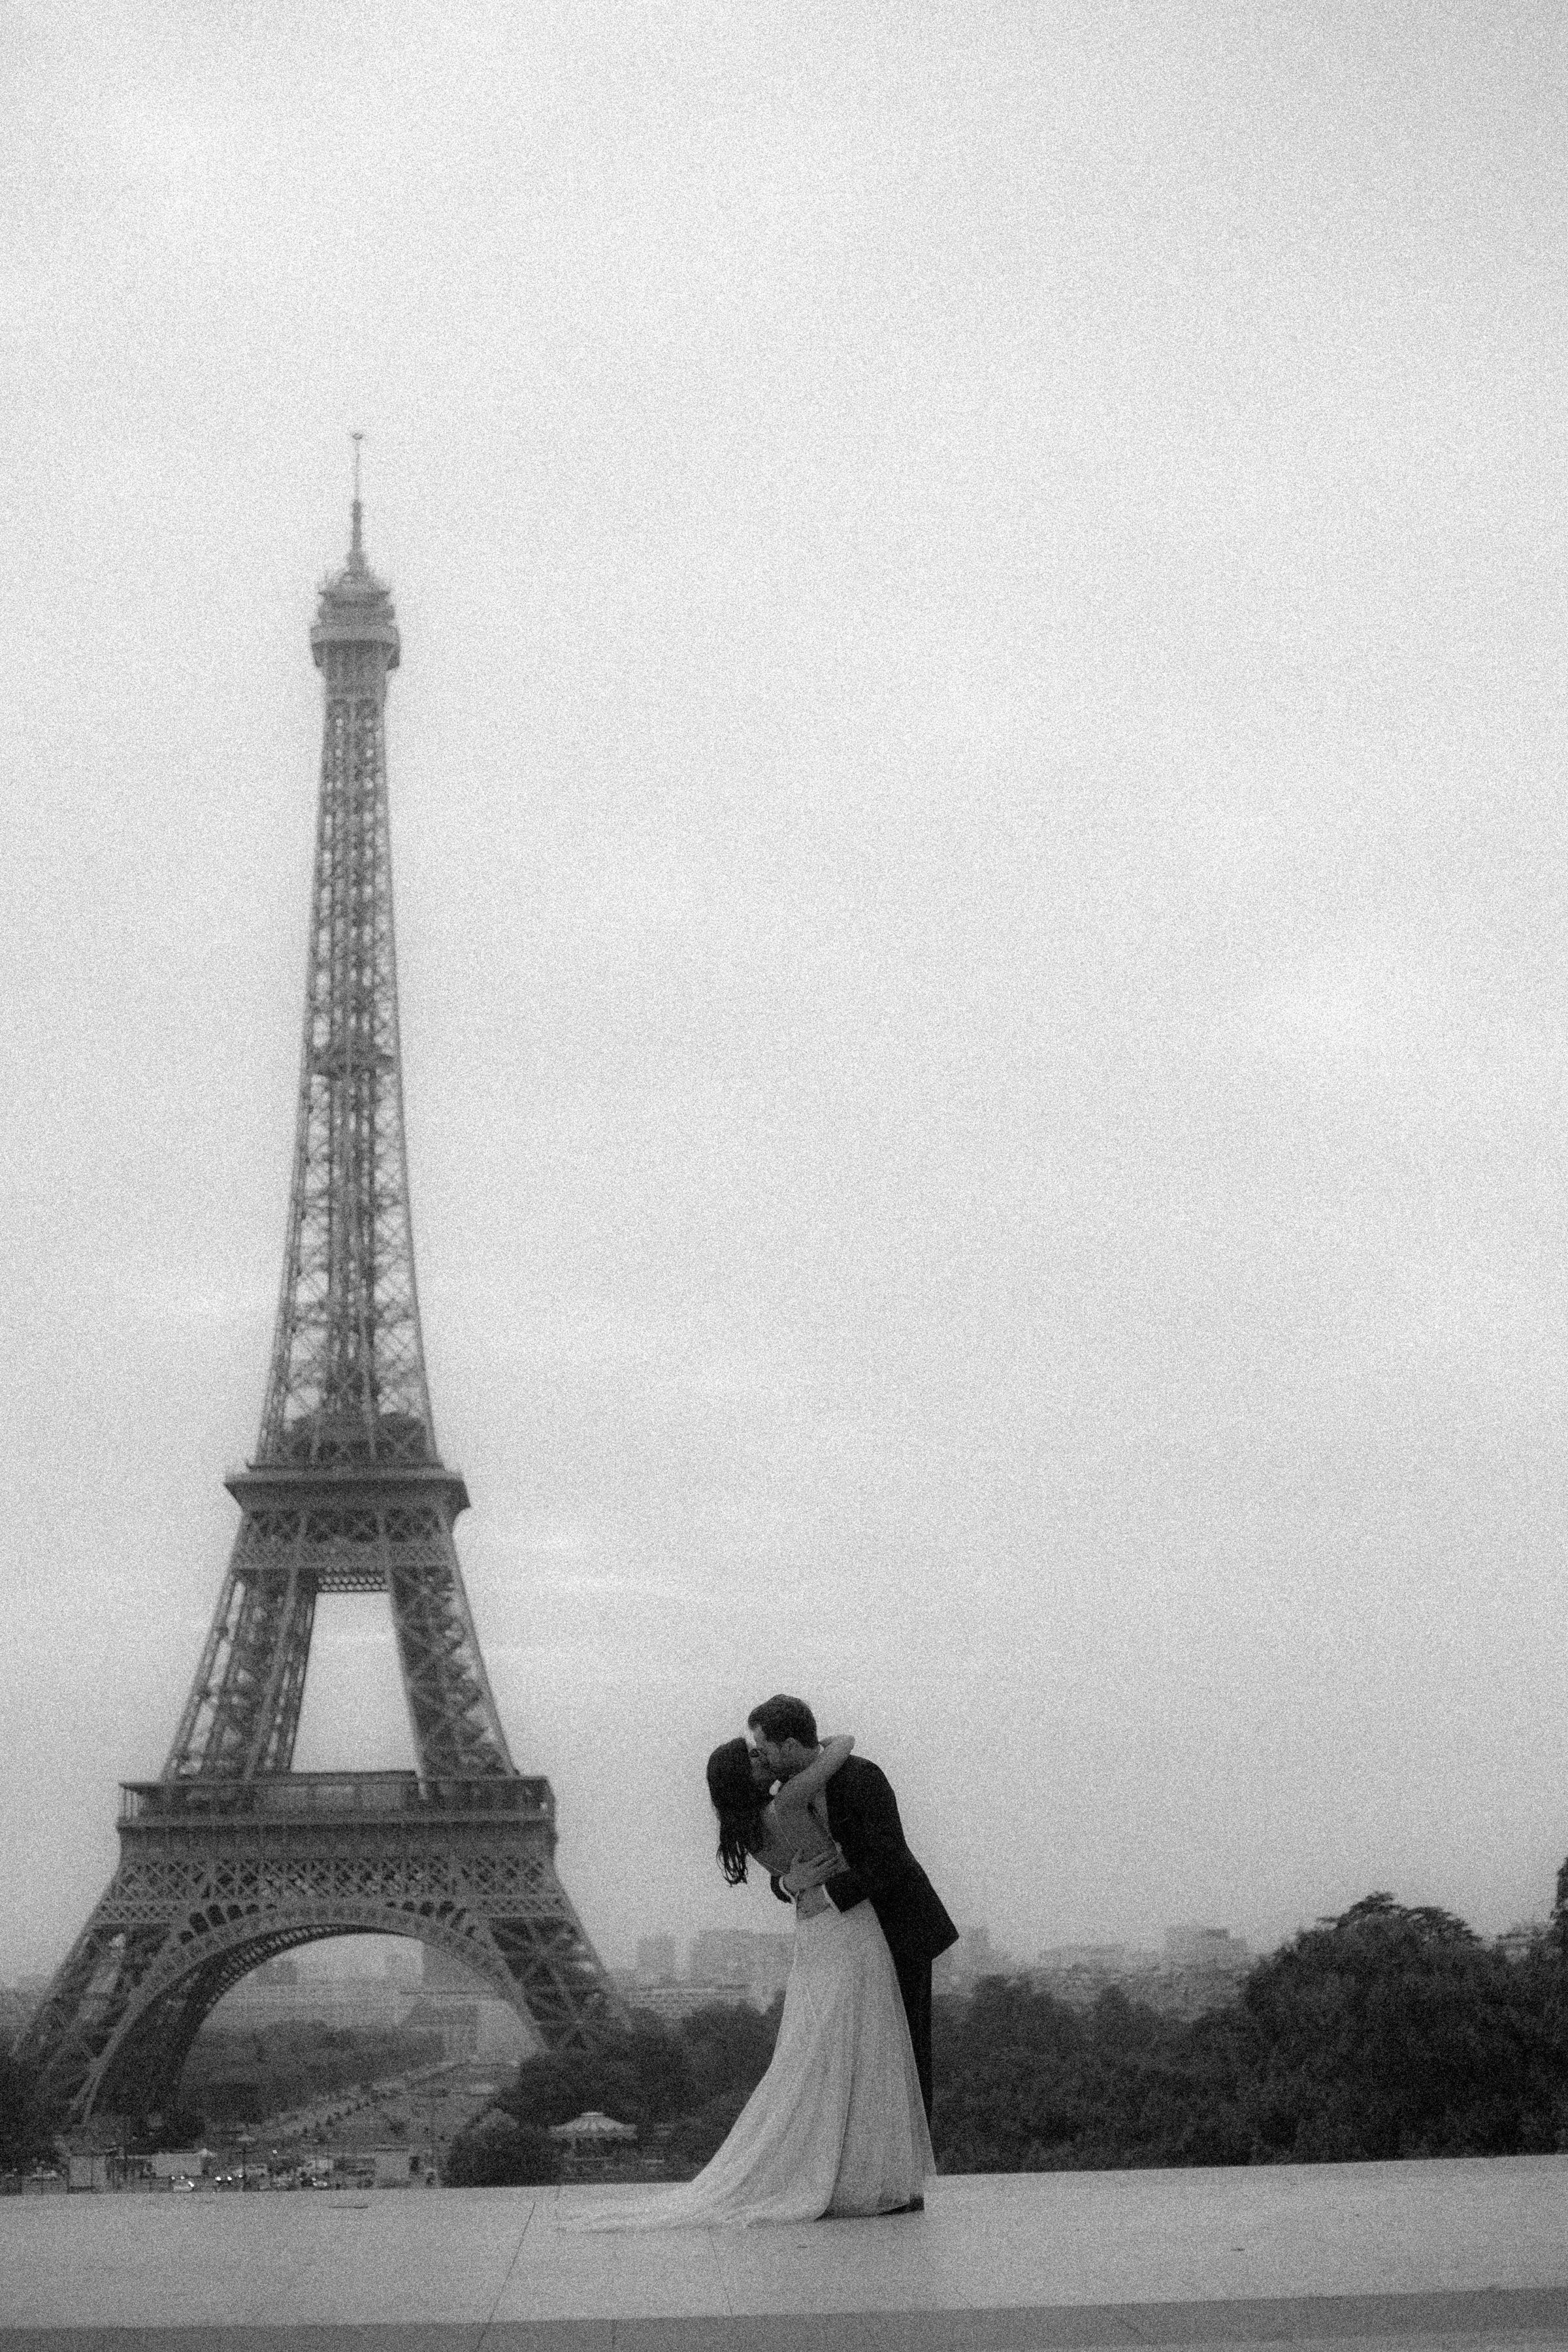 paris wedding photographer craig george hannah and mitch elopment-39.jpg